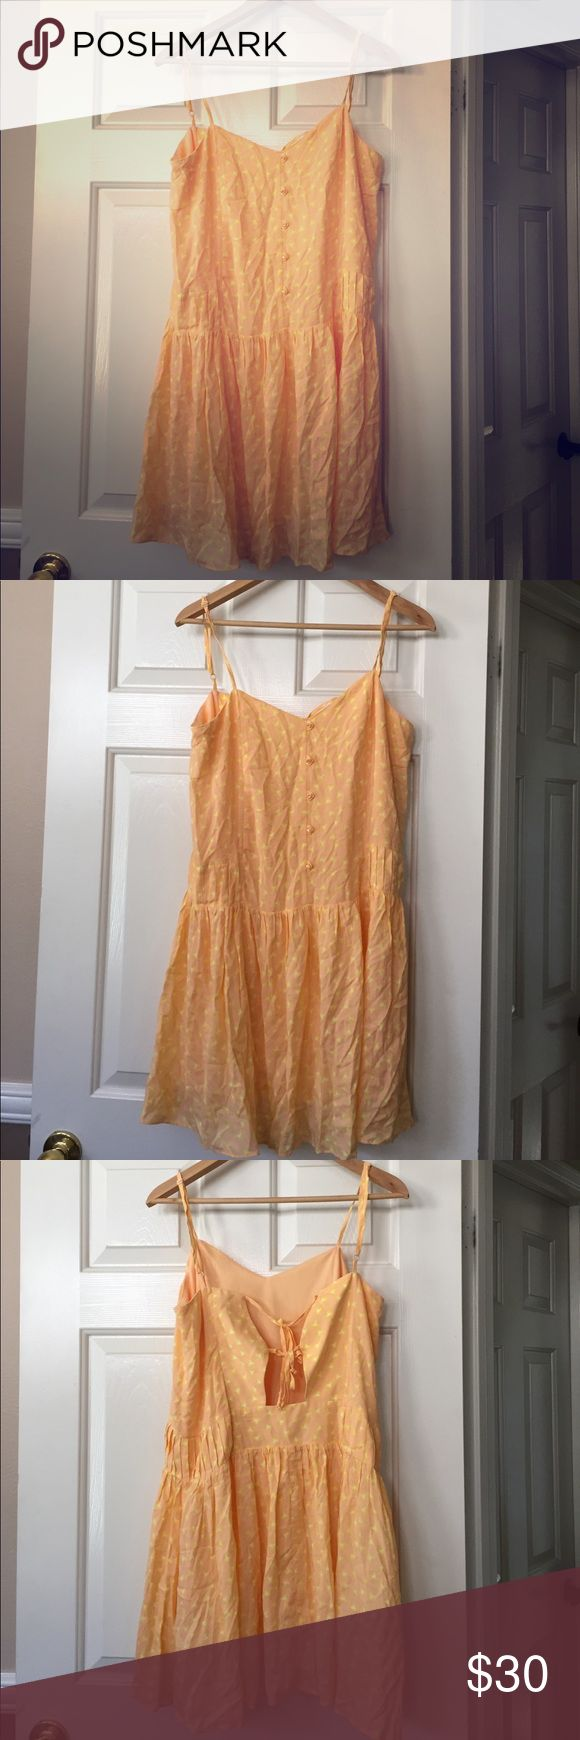 BCBGeneration Orange Occasion Dress M Gently Preloved BCBGeneration Dresses